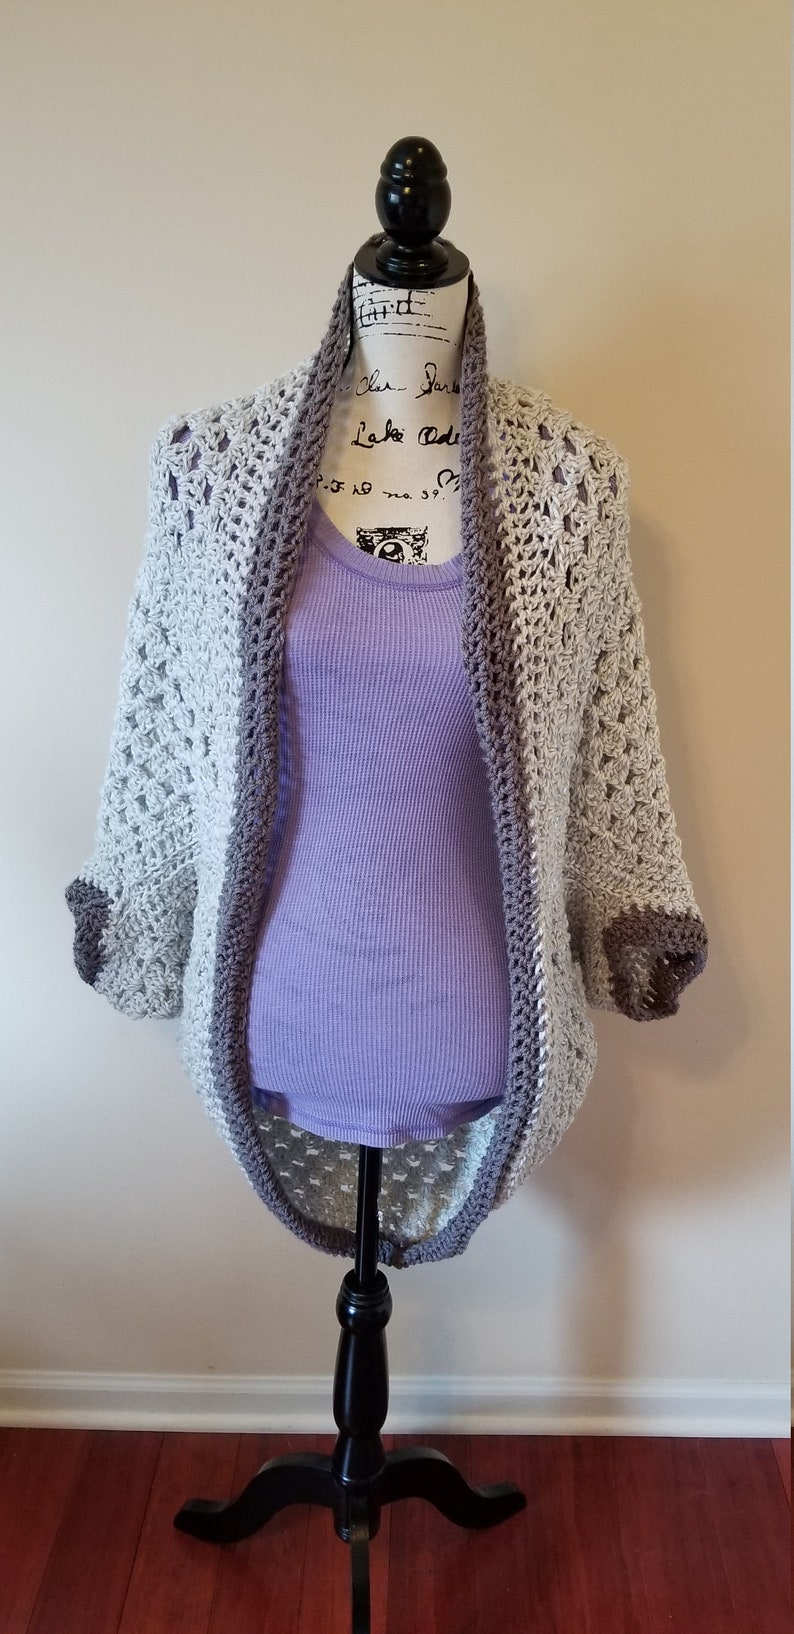 Marle Gray  Crochet Cocoon Sweater  Crochet Cocoon Cardigan  Crochet Cocoon Wrap